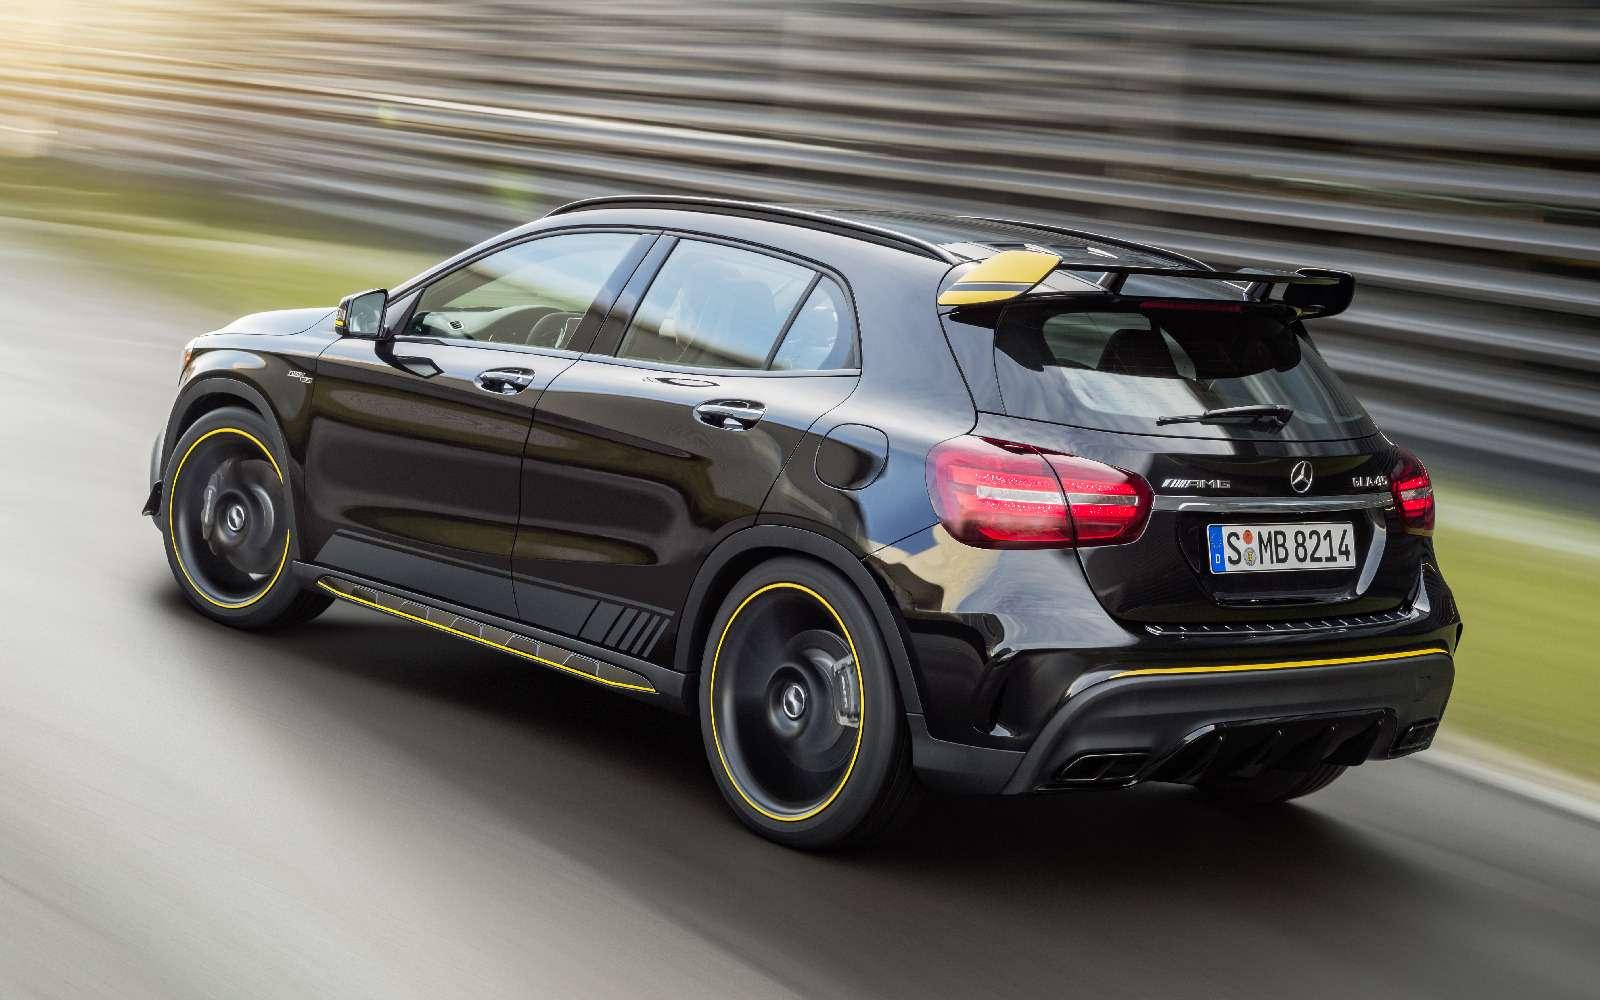 Mercedes-Benz GLA стал краше, нонепросторнее— фото 690087